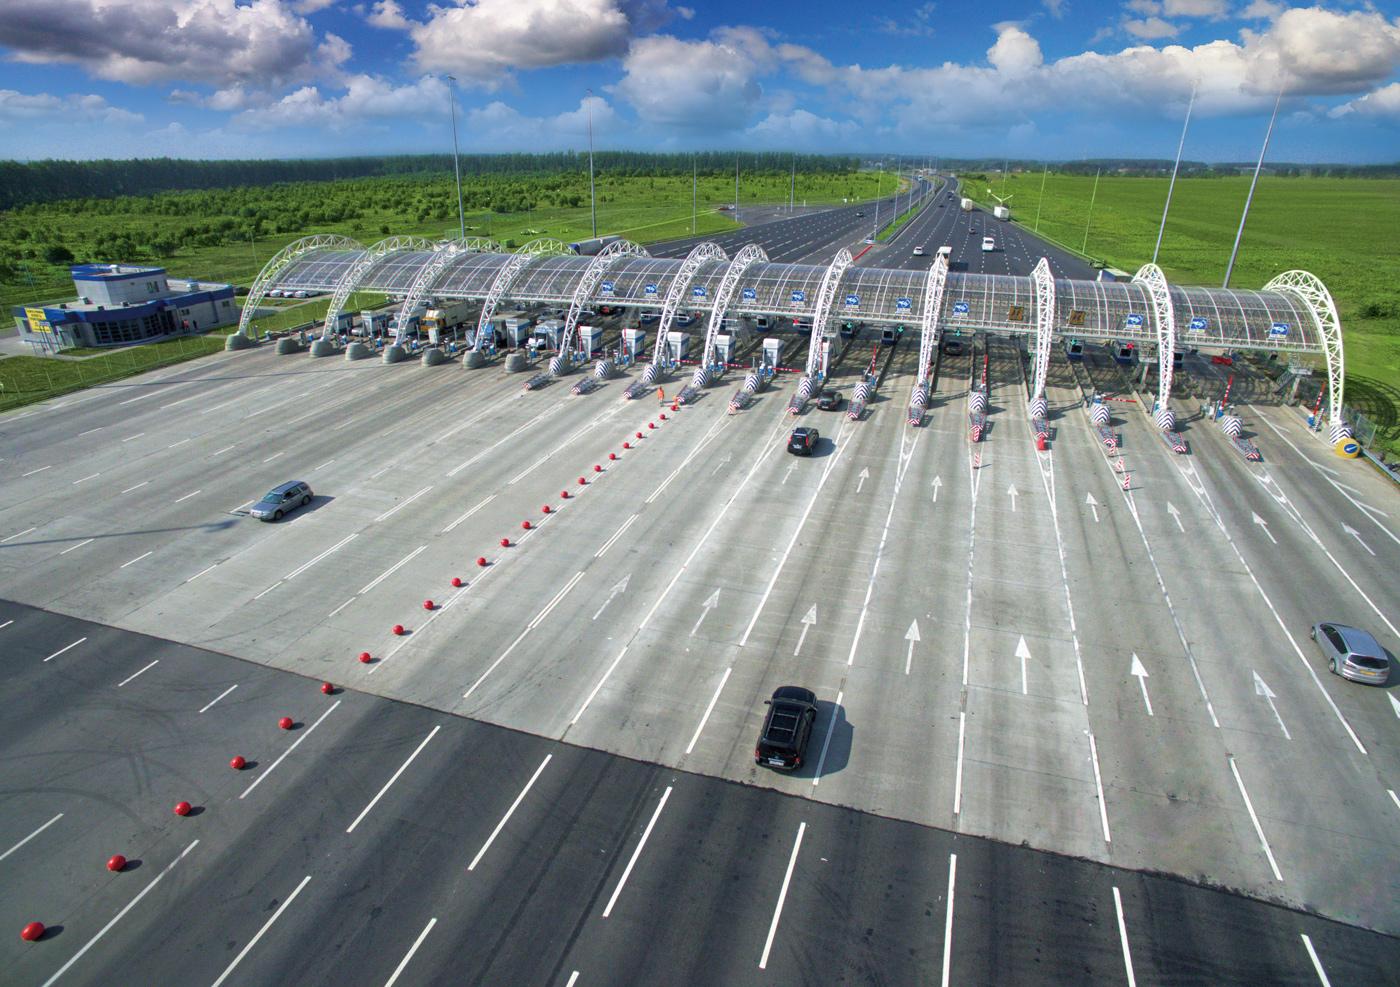 Тариф на трассе «Москва-Казань» составит около 2,5 рубля за километр